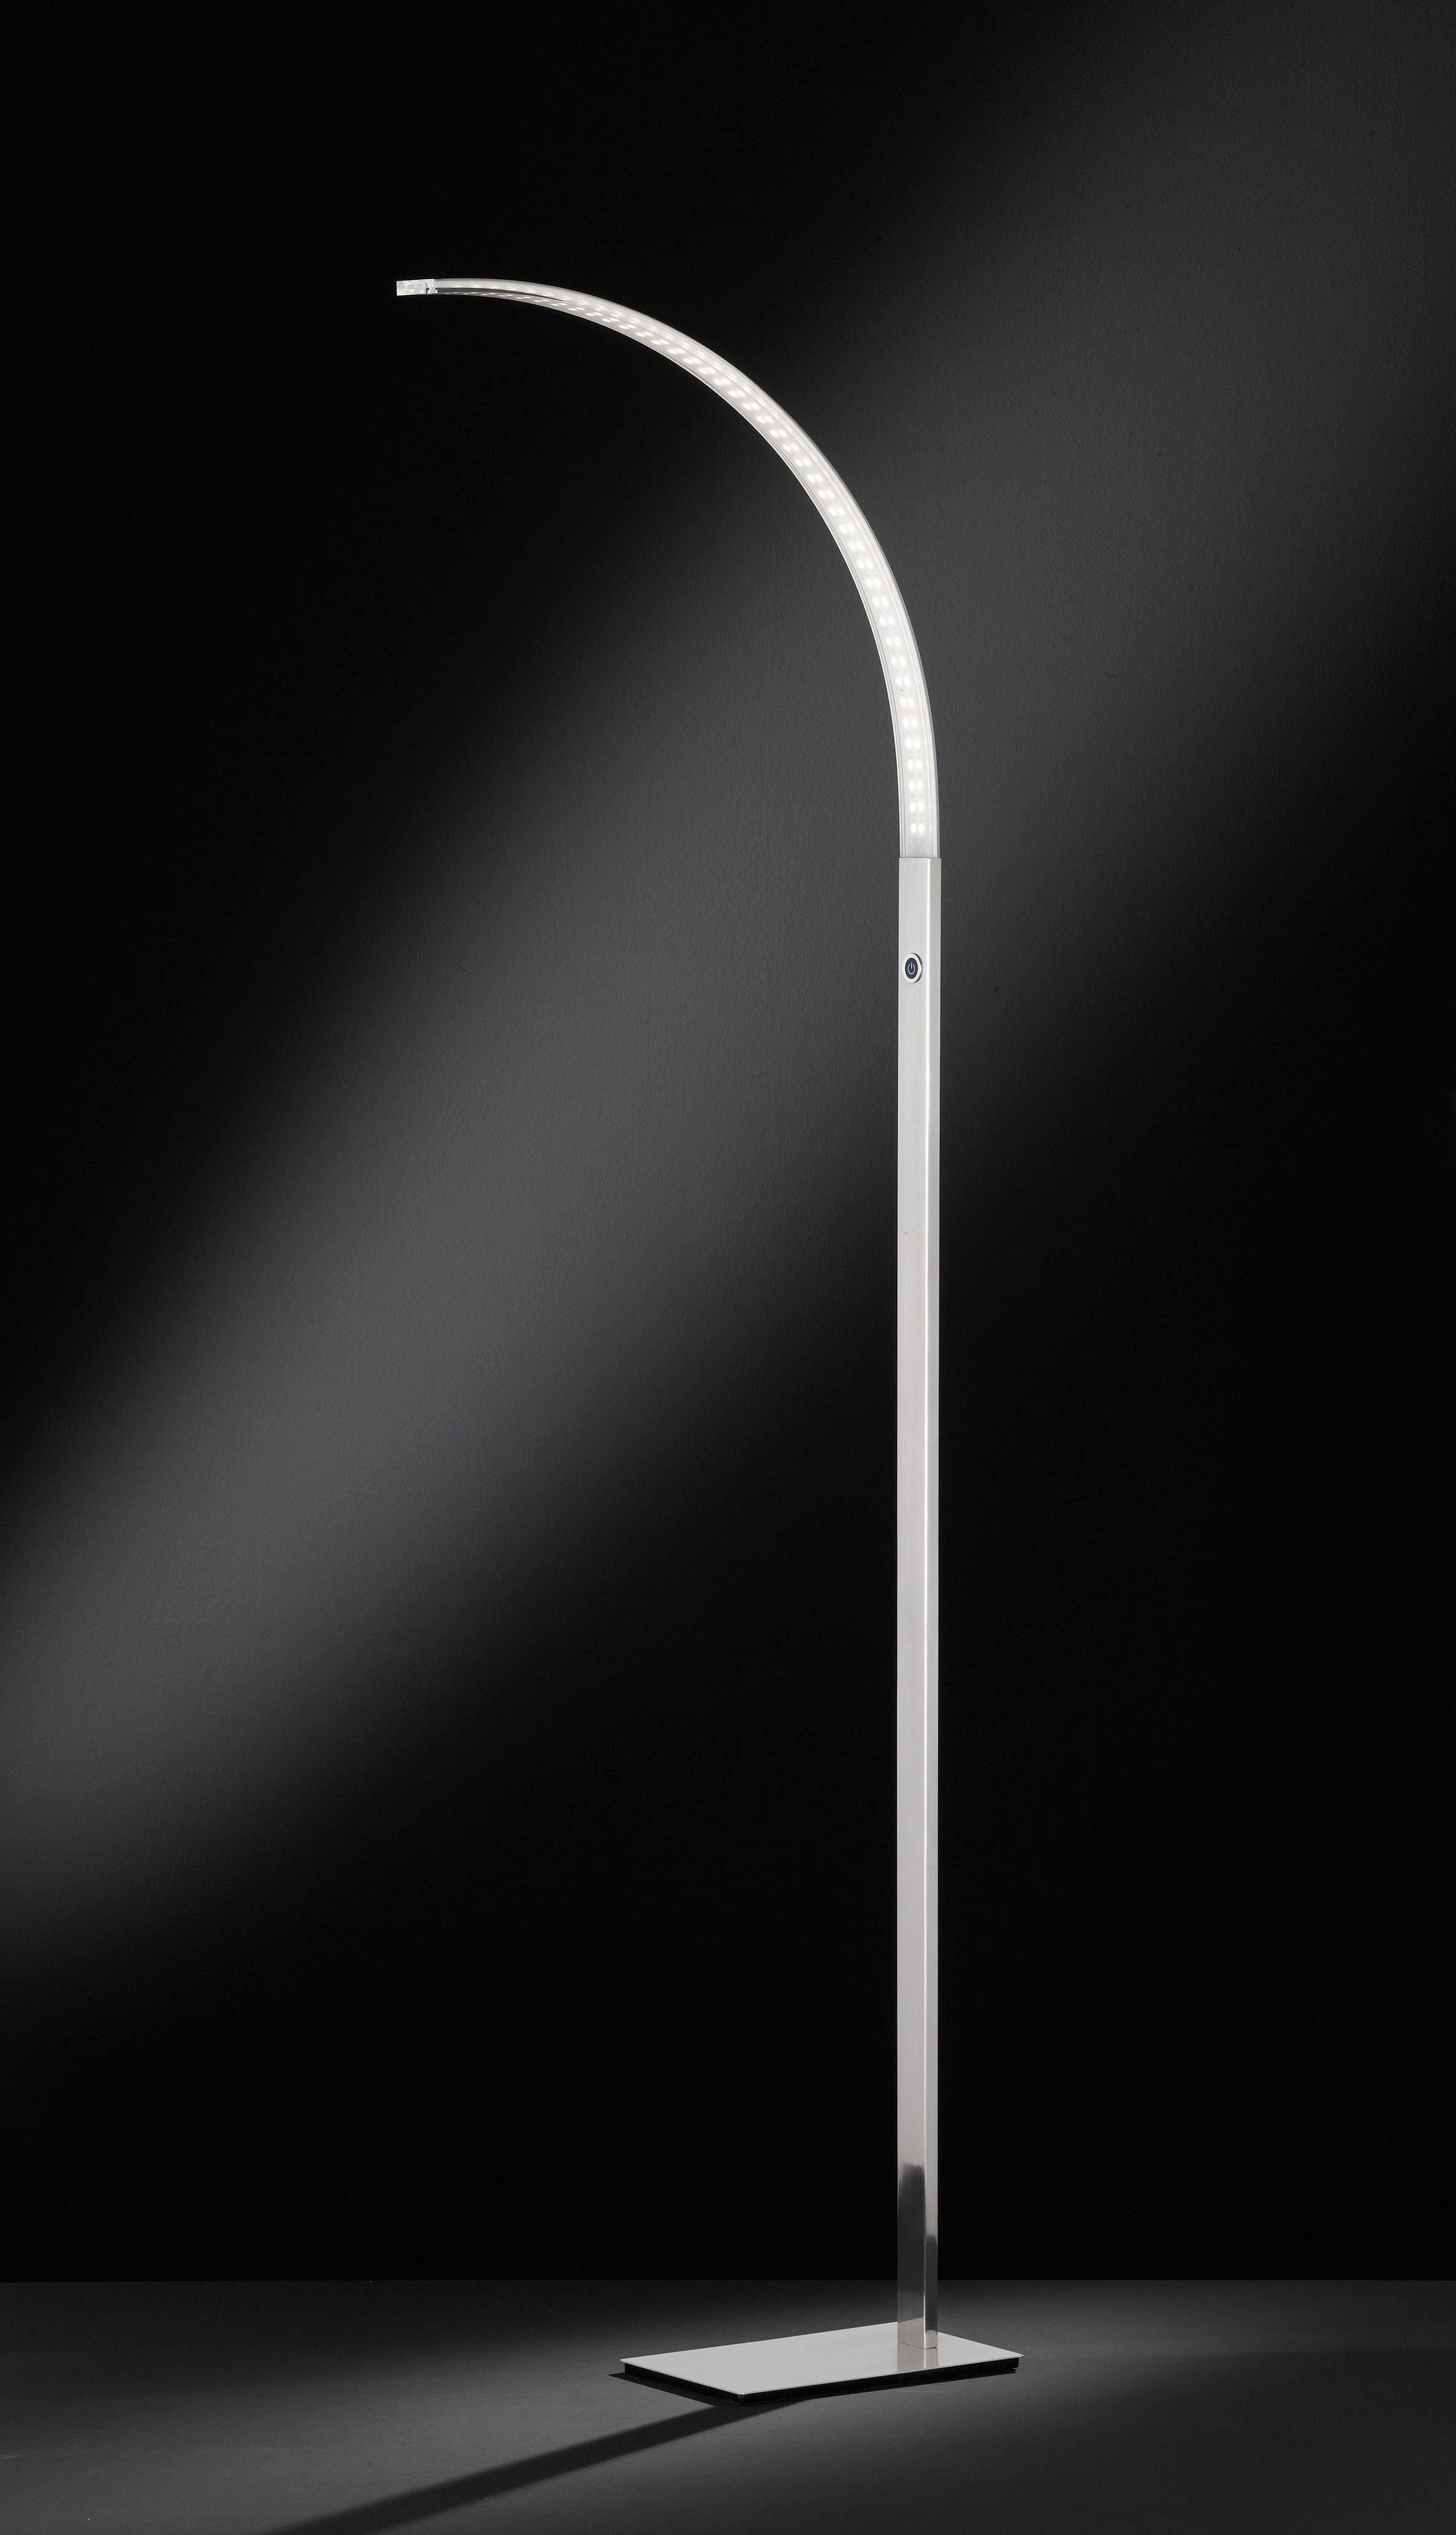 LED-STEHLEUCHTE - Nickelfarben, Design, Kunststoff/Metall (48/165/48cm)